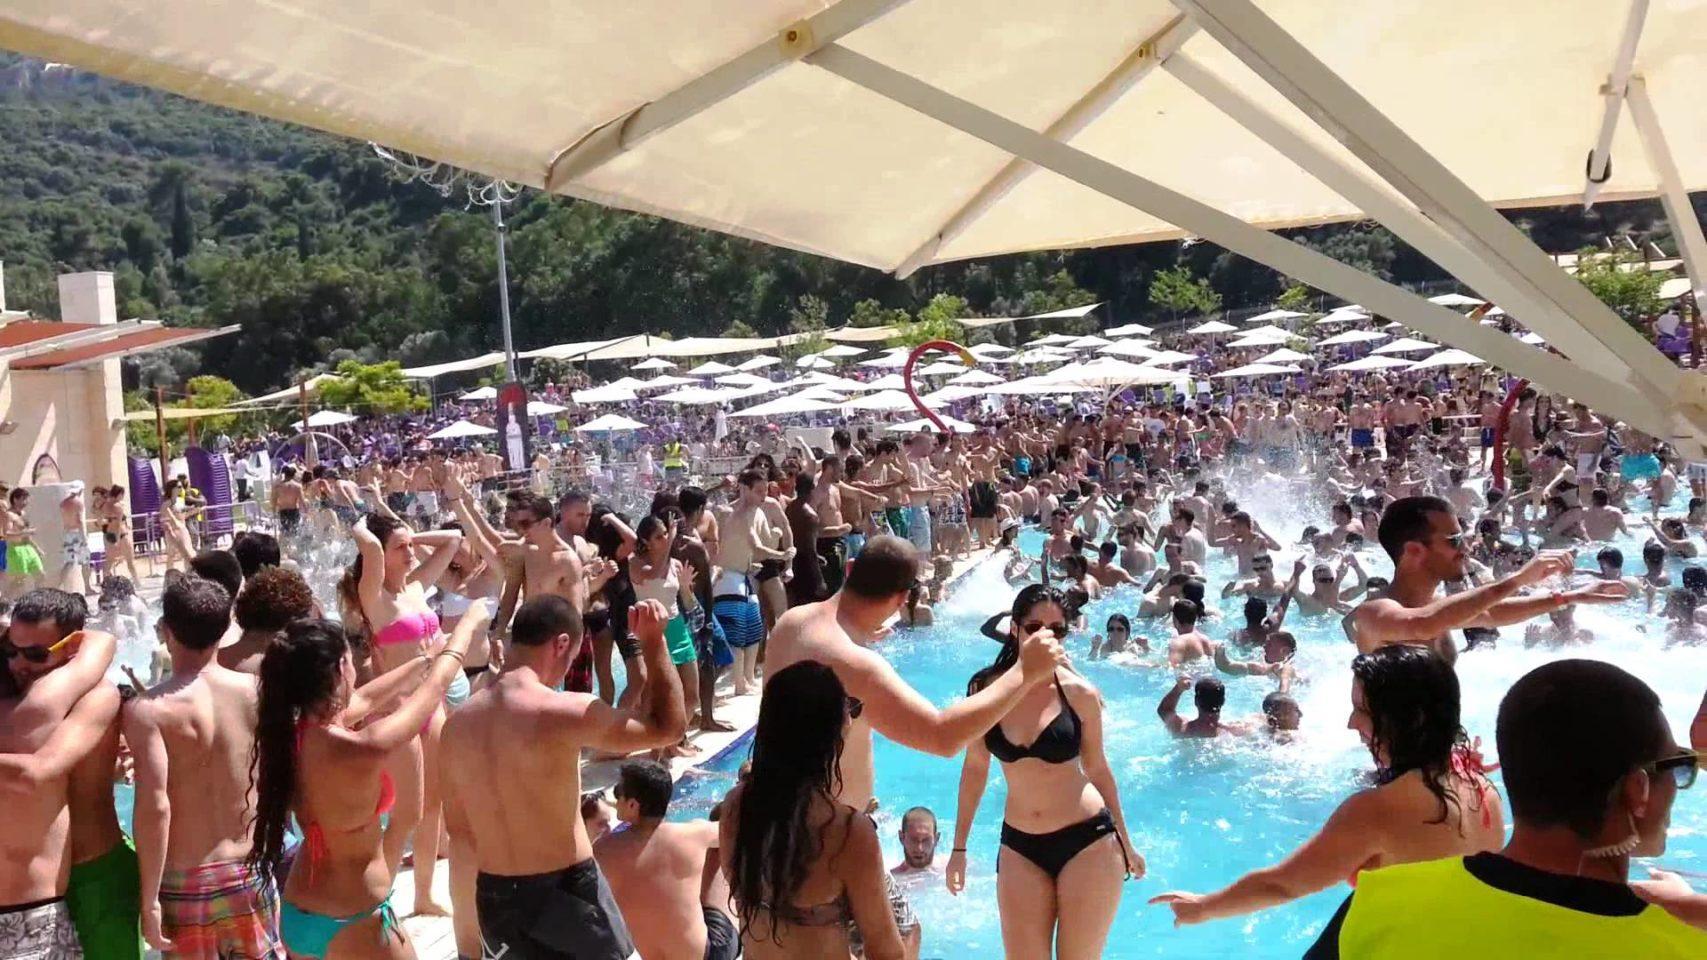 Technion : Student party (photo HammodiZ)